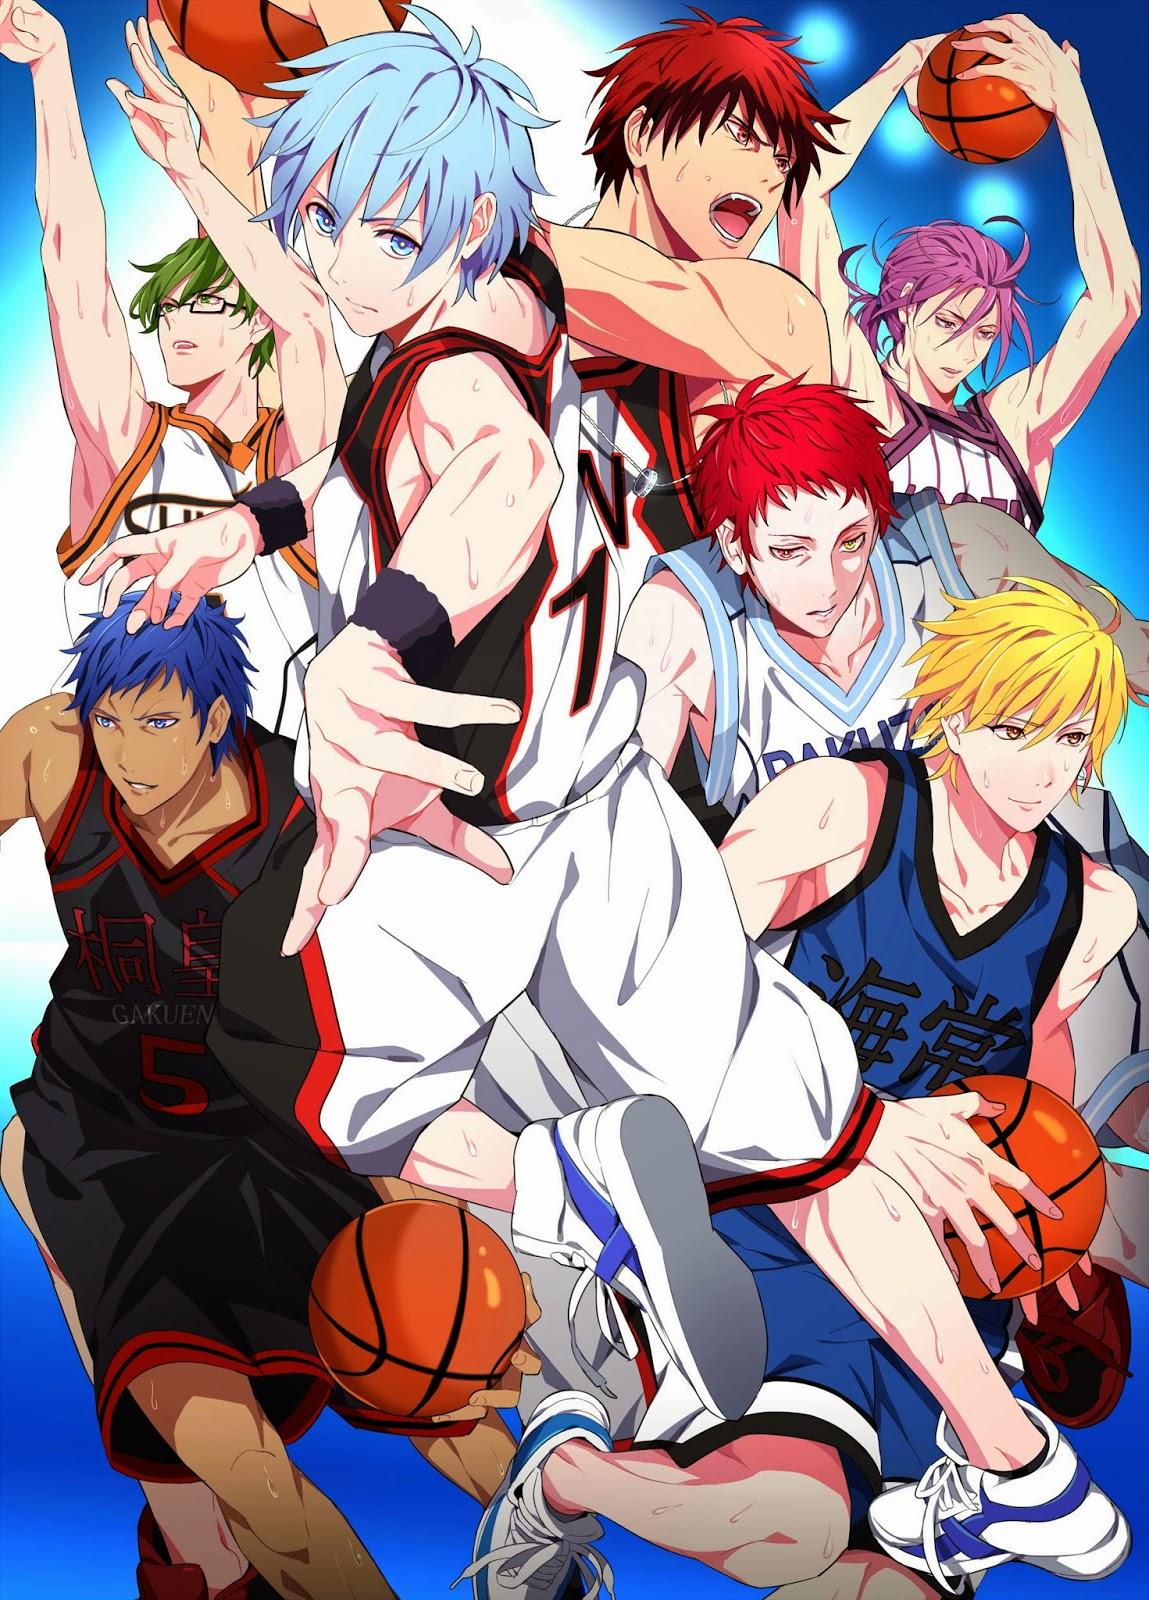 Kuroko no basket season 3 release date